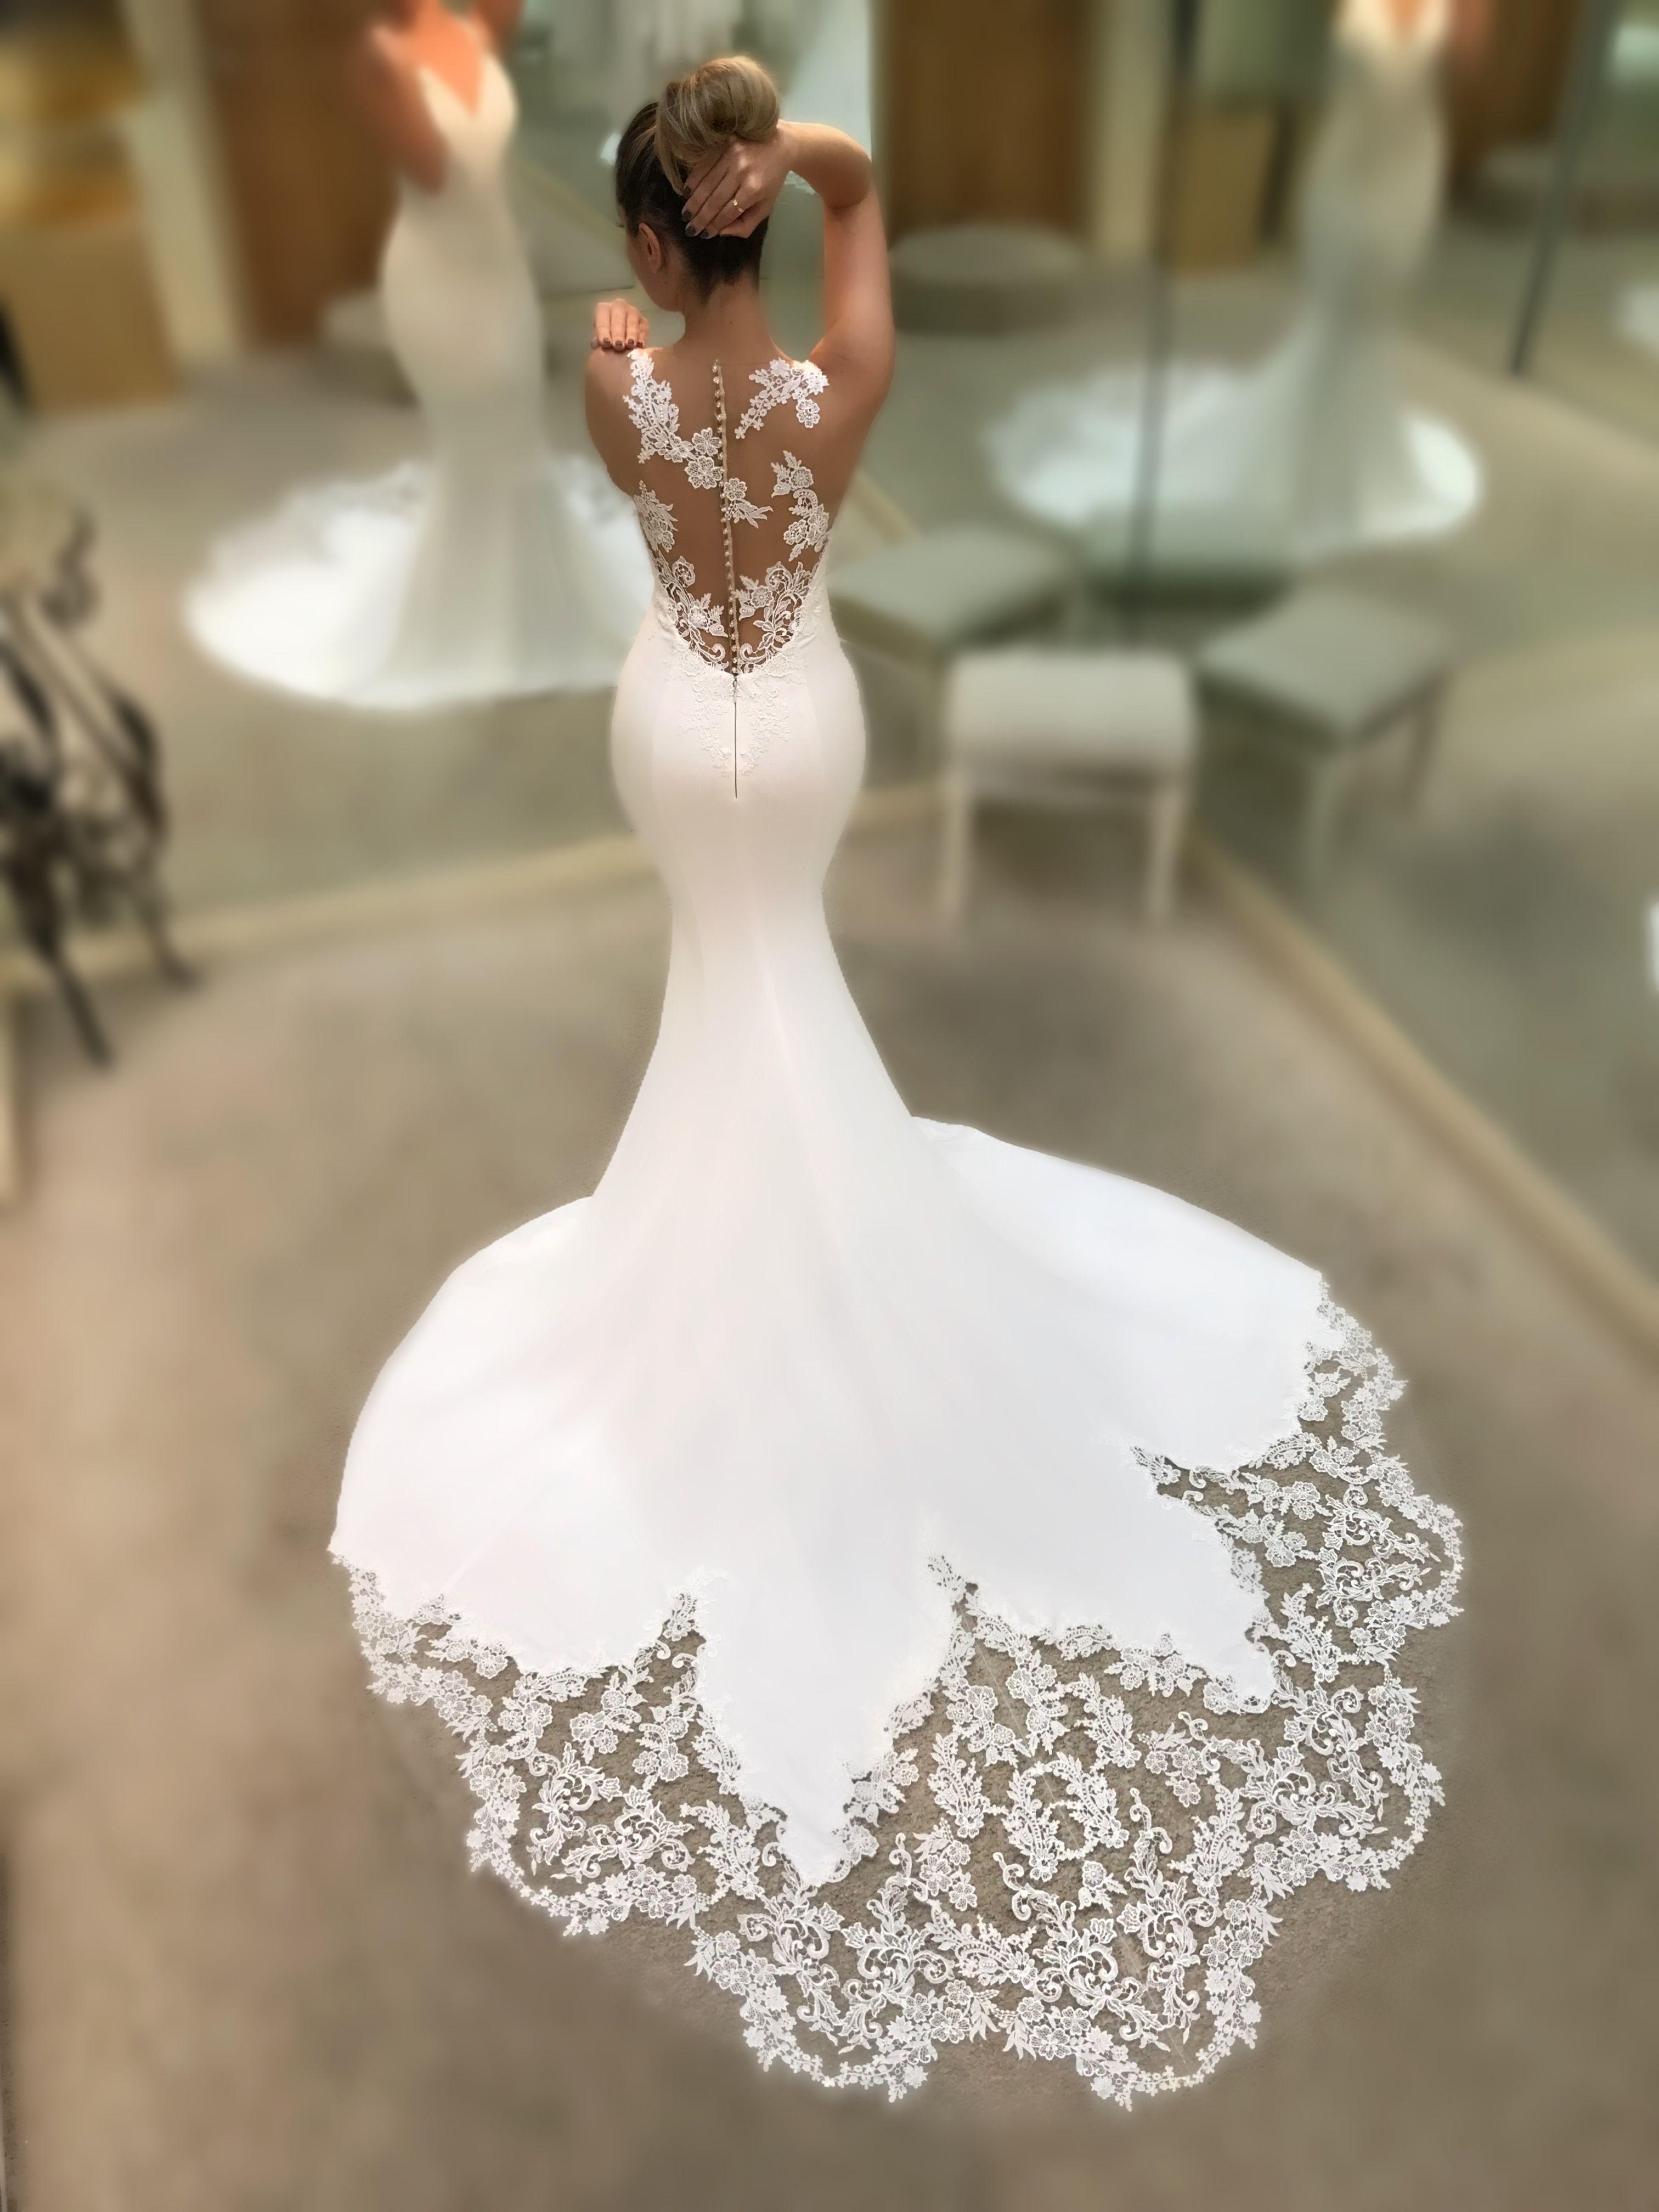 Blue By Enzoani 2018 Kalypso Wedding Dress Bridal Gown Enzoani Wedding Dresses Wedding Dresses Dream Wedding Dresses [ 4032 x 3024 Pixel ]